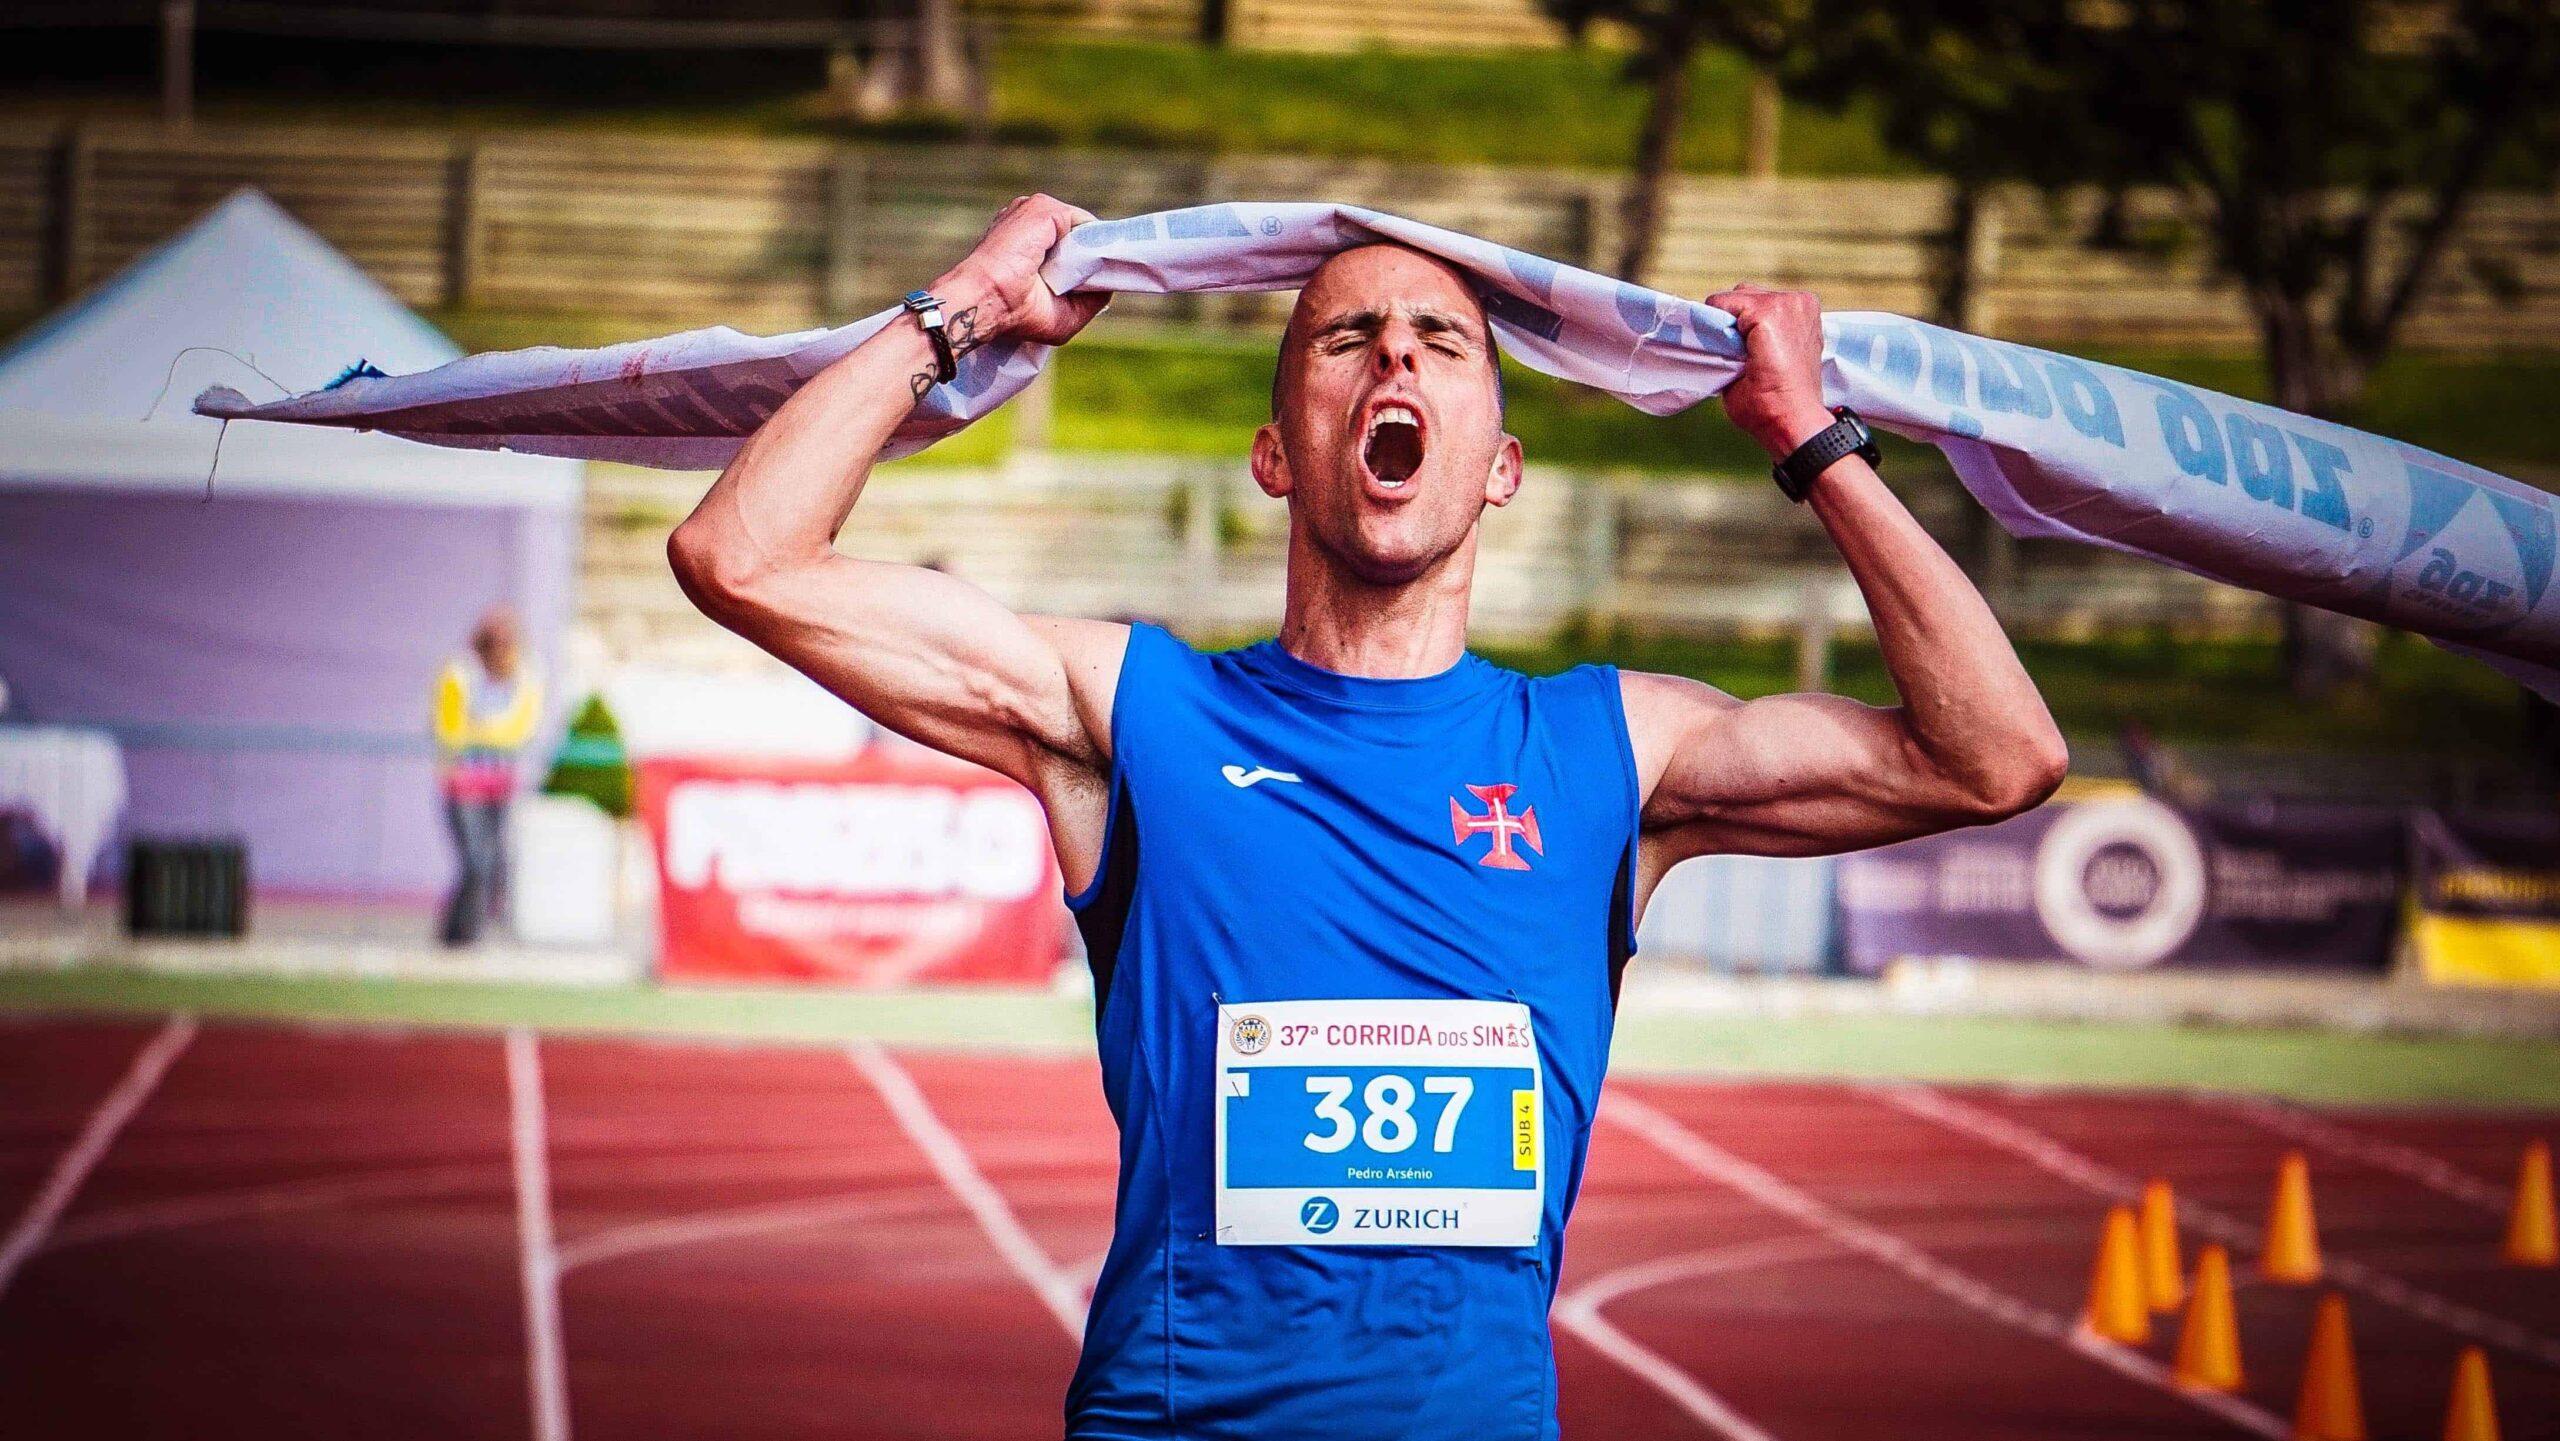 digital marketing champion seo run winner victory content tracking